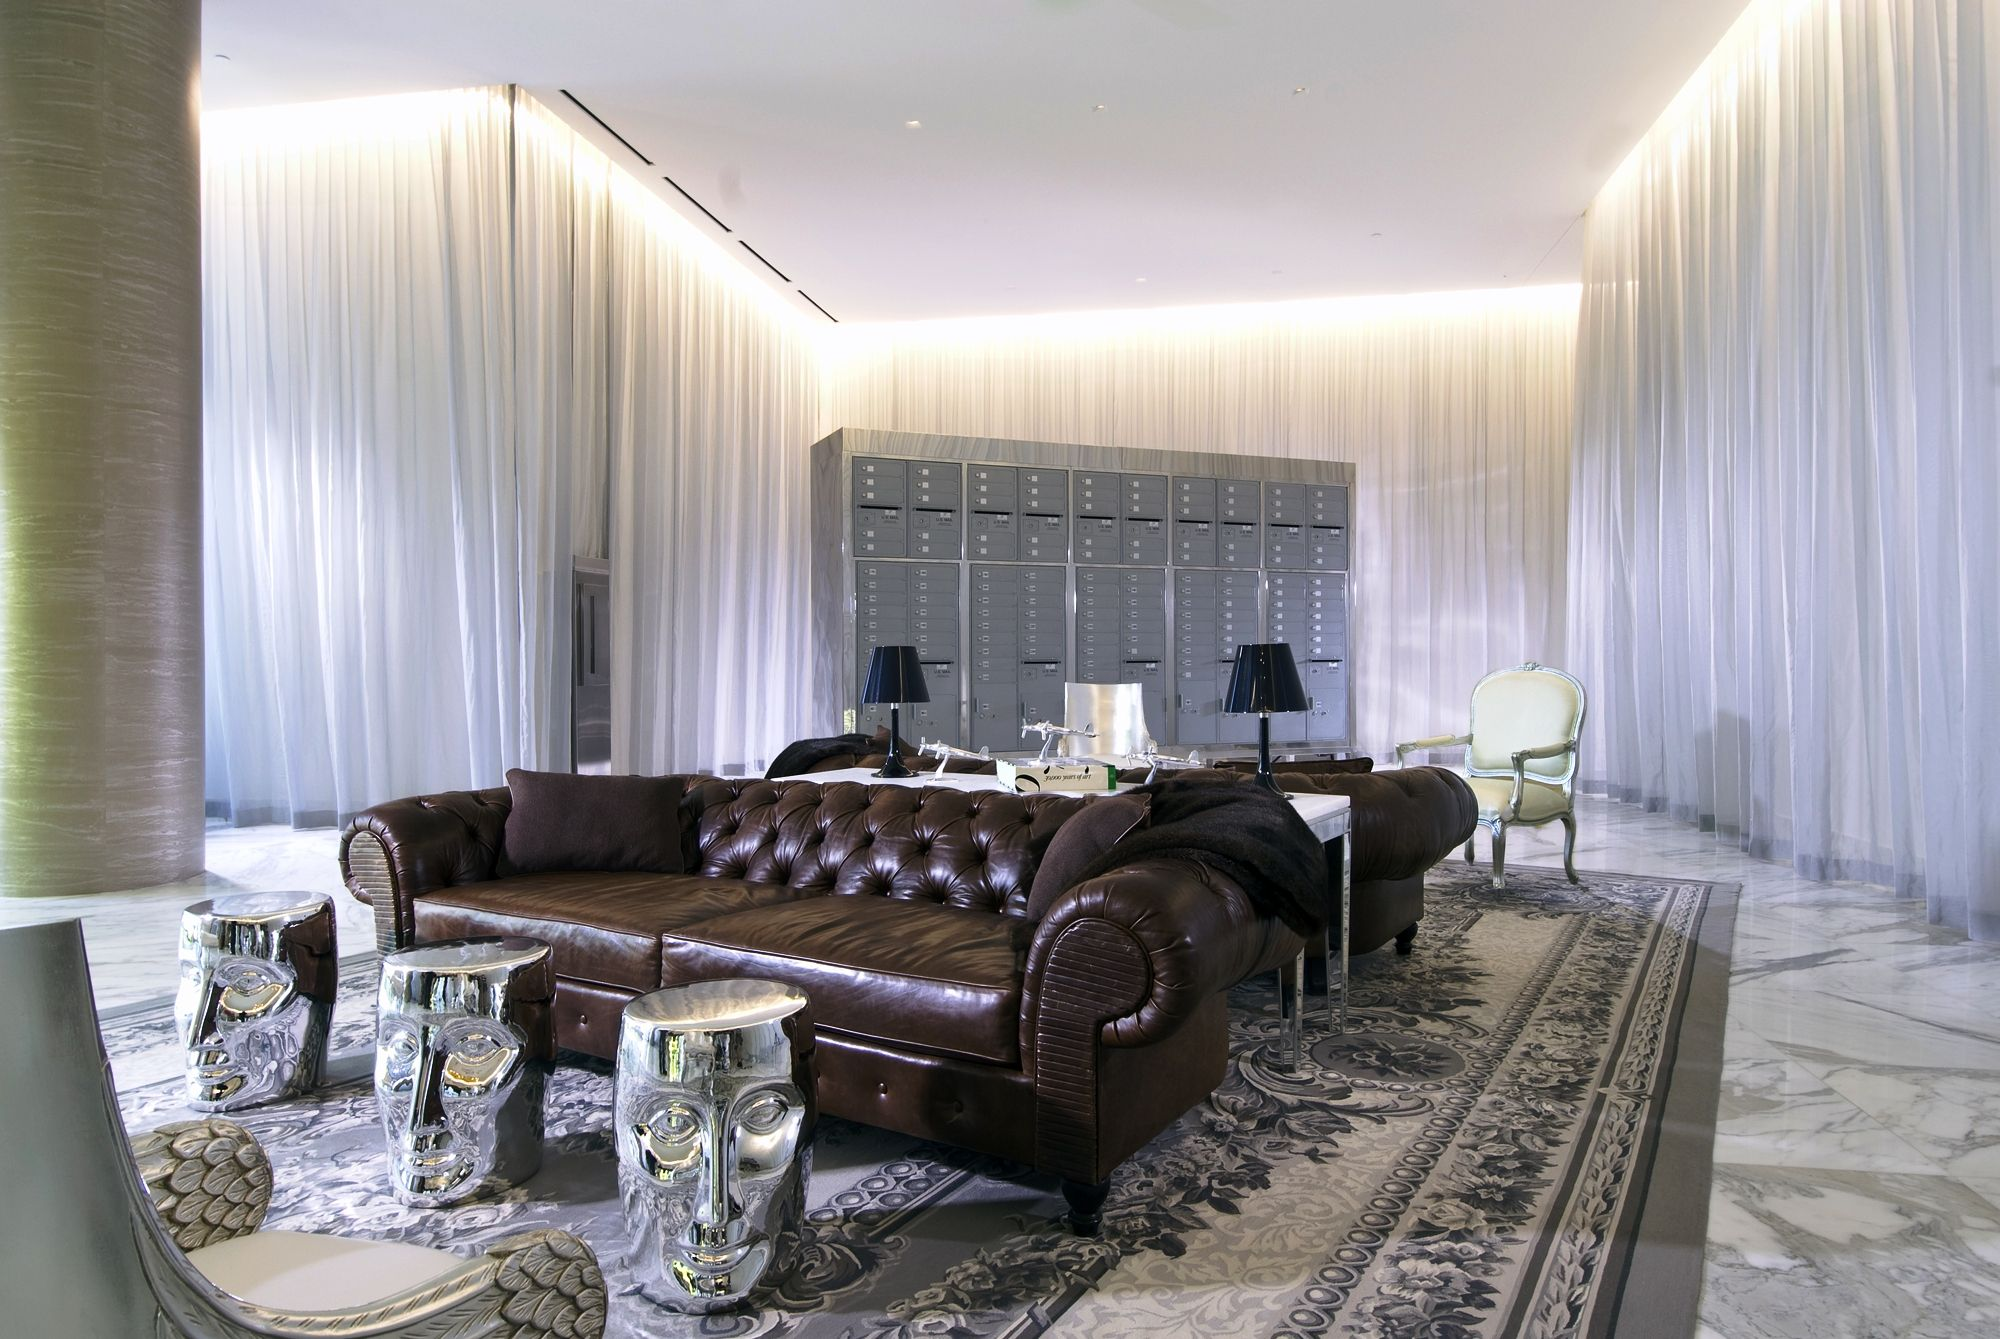 Best interior designers dallas tx - Interior Decoration Ideas By Philippe Starck Dallas Texaslobbiesphilippe Starcktop Interior Designershotel